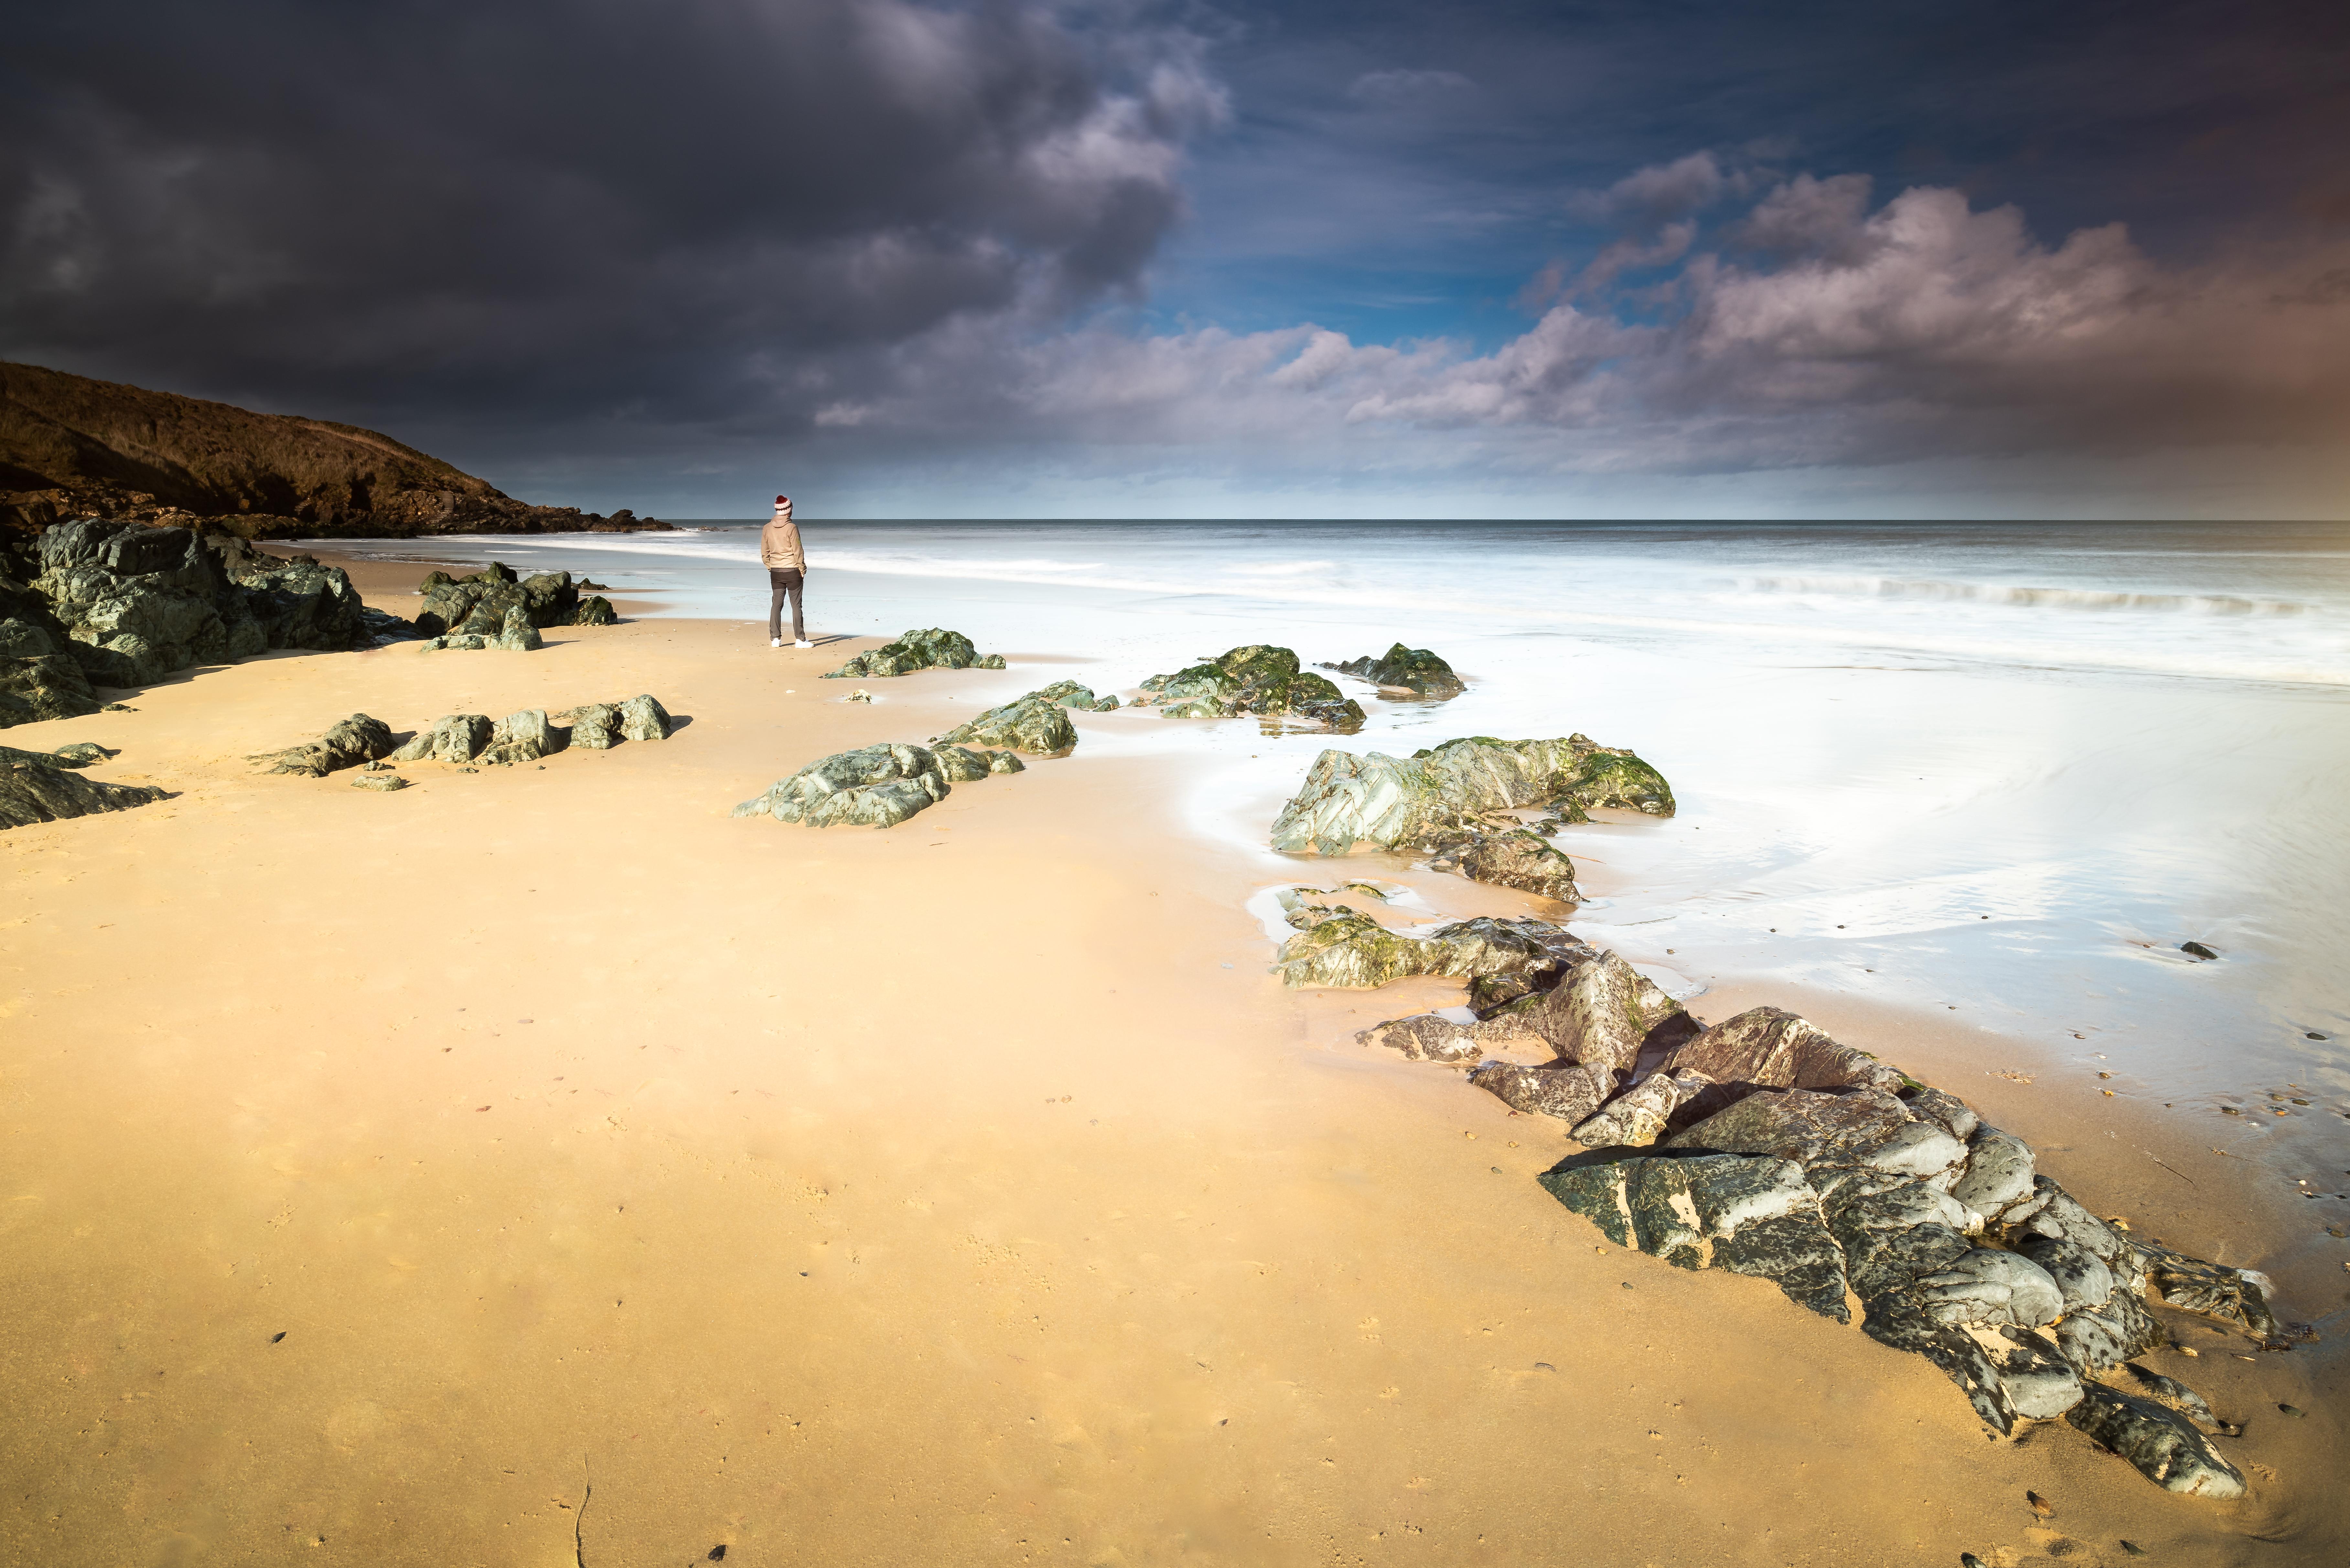 Cahore Beach Wexford Ireland Clouds Rock